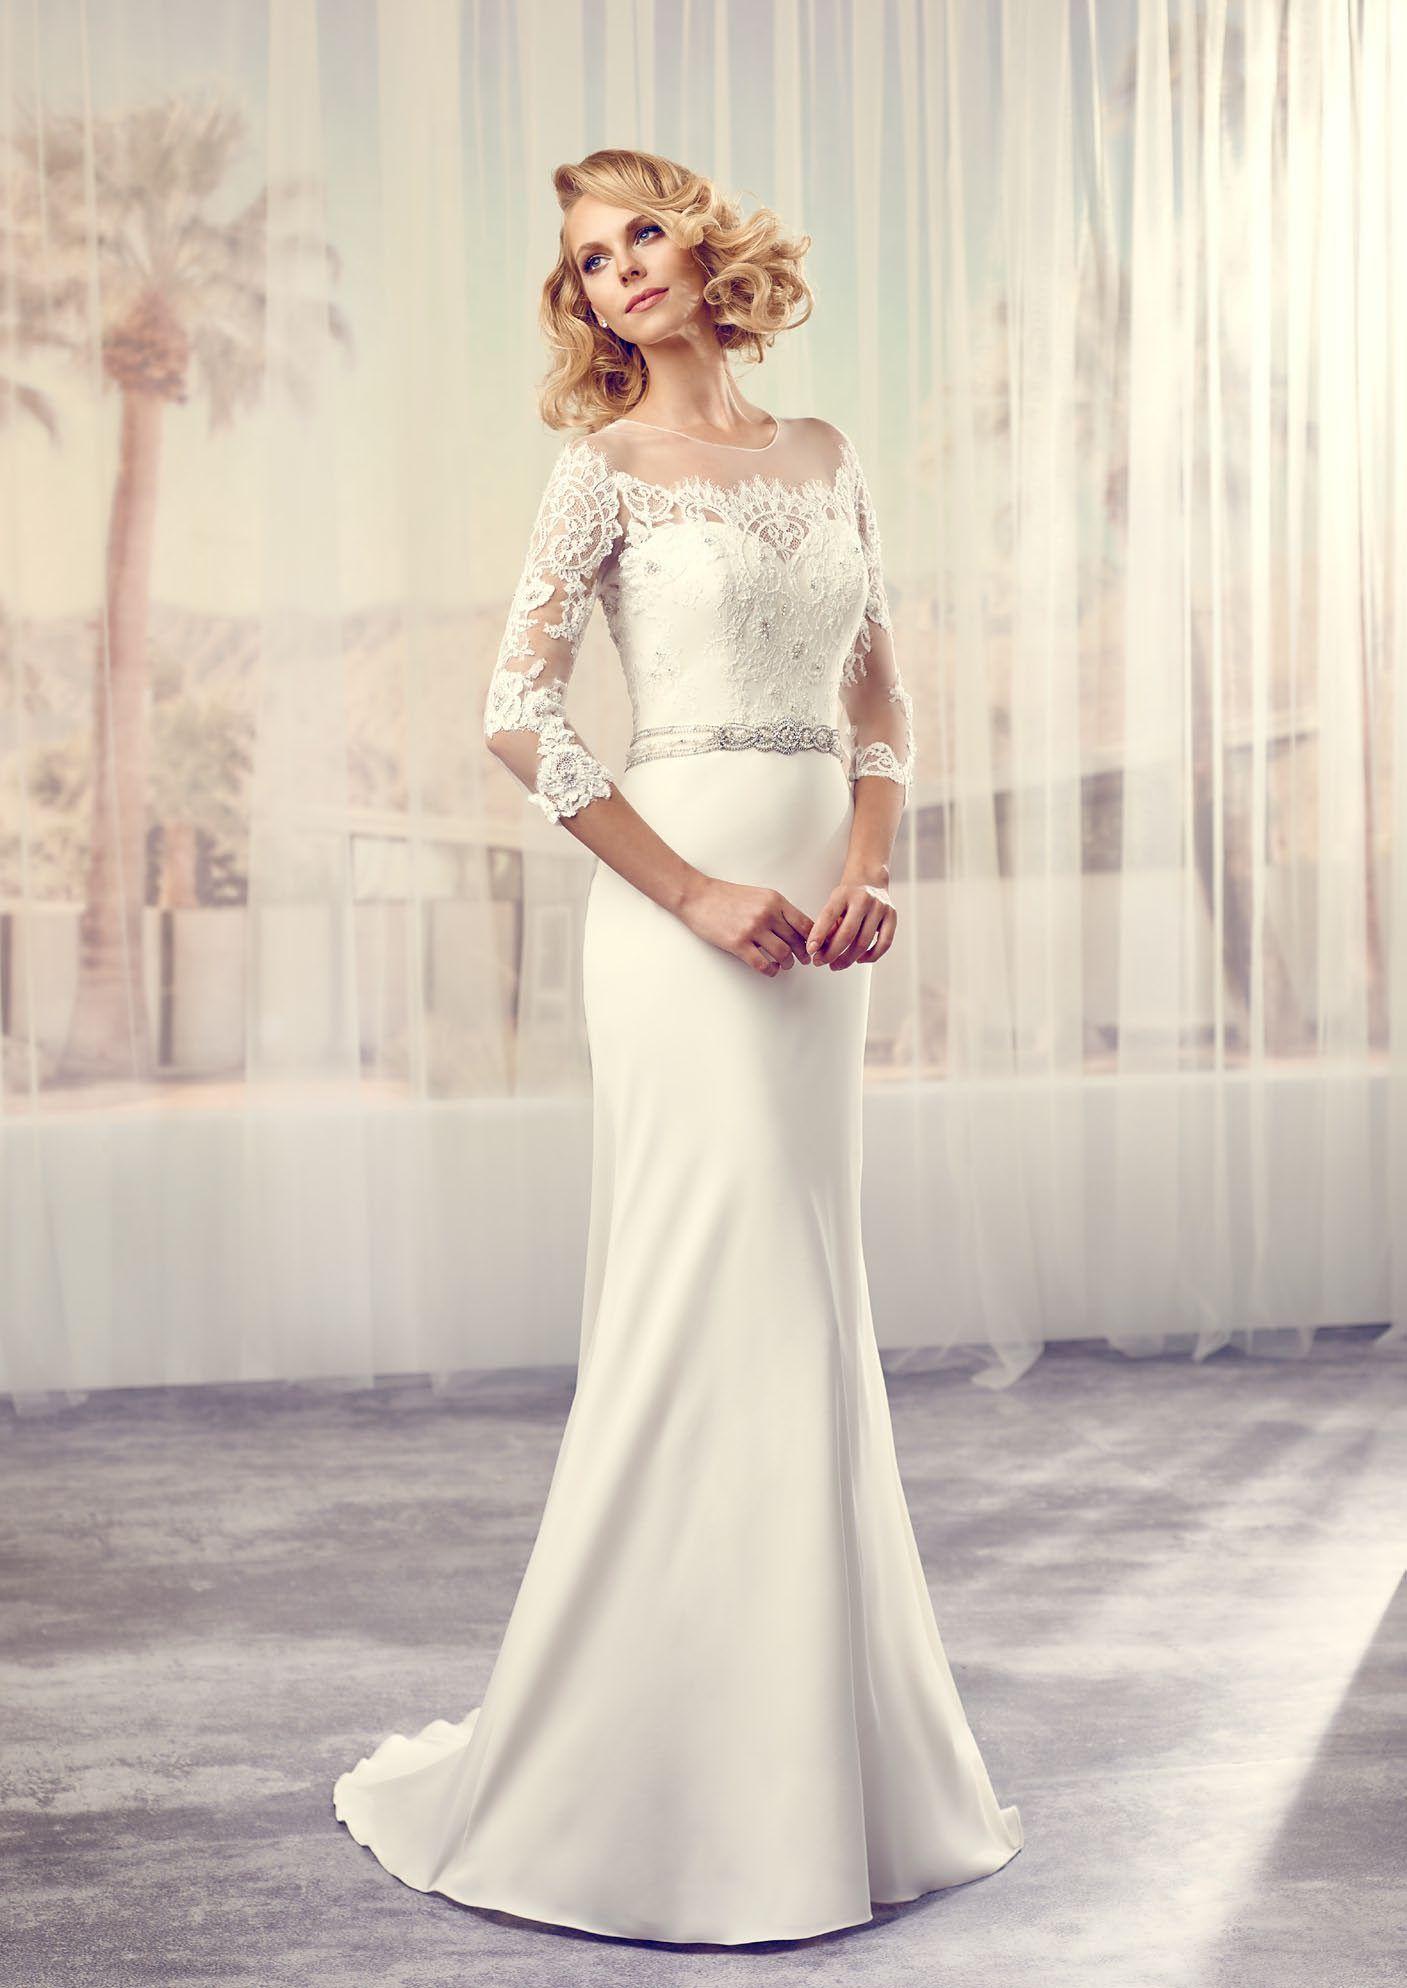 Le Papillon By Modeca Style Savanna Www Modeca Com Wedding Dresses Gown Wedding Dress Dresses